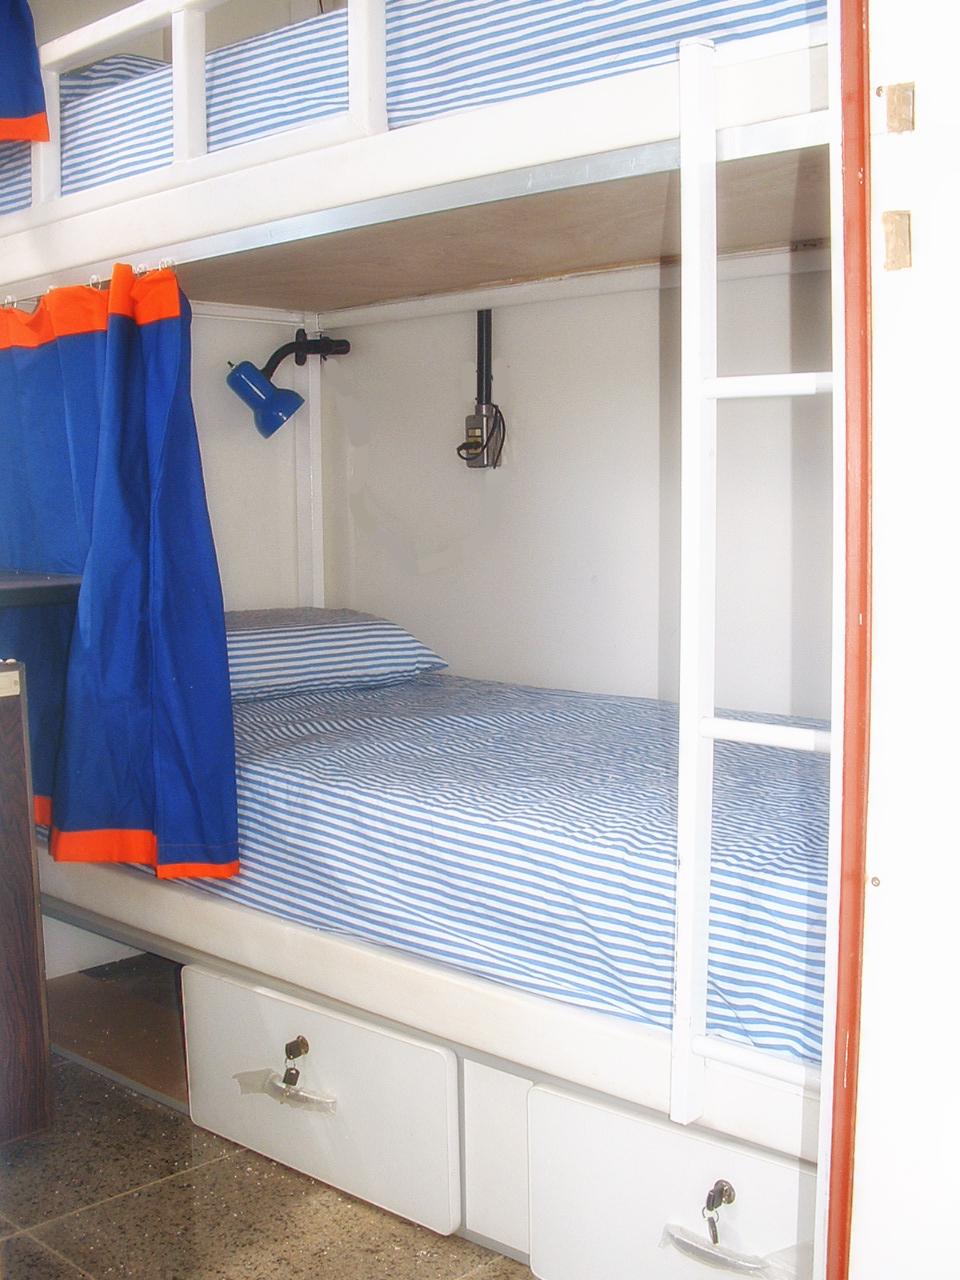 container_1_dorm.jpg